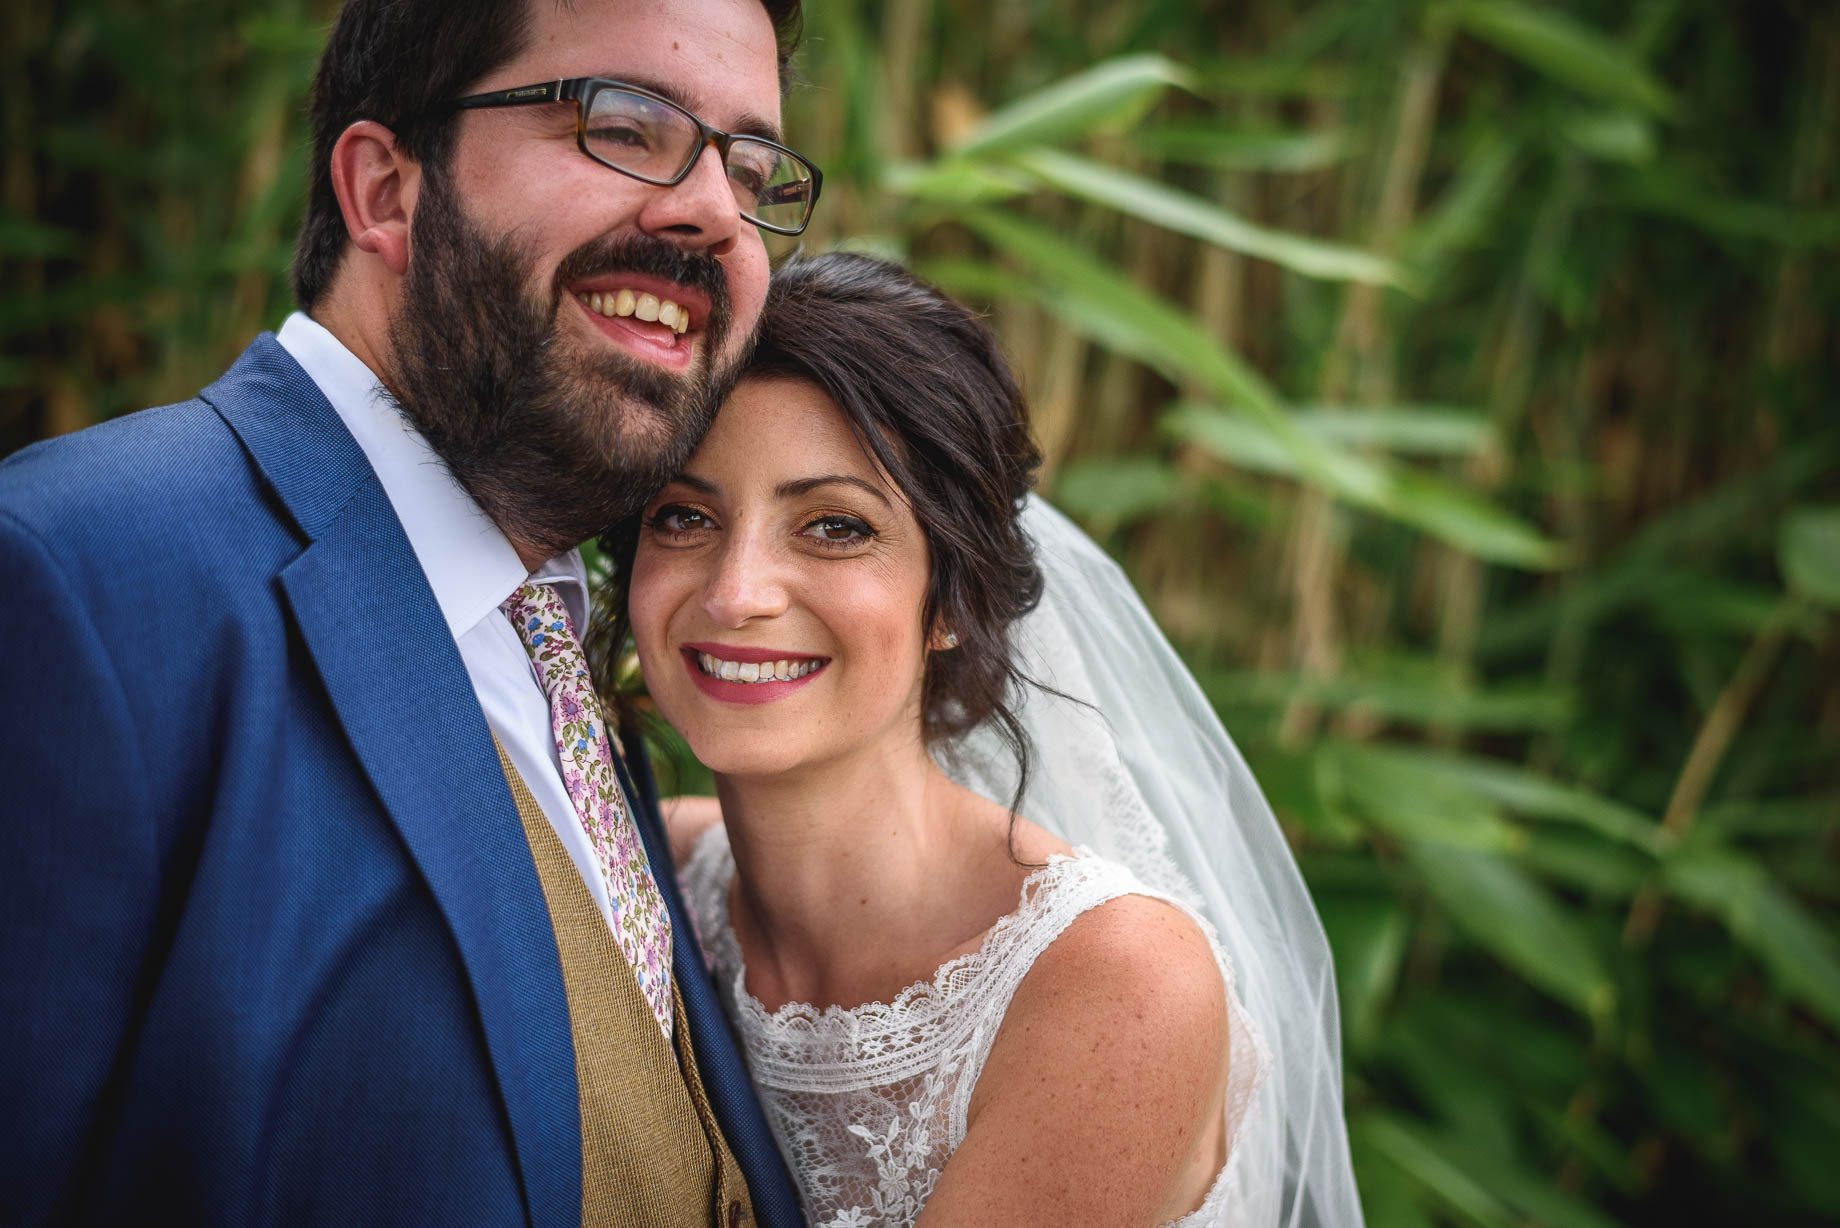 Gaynes Park wedding photography - Guy Collier Photography - Rachel and Jon (147 of 169)